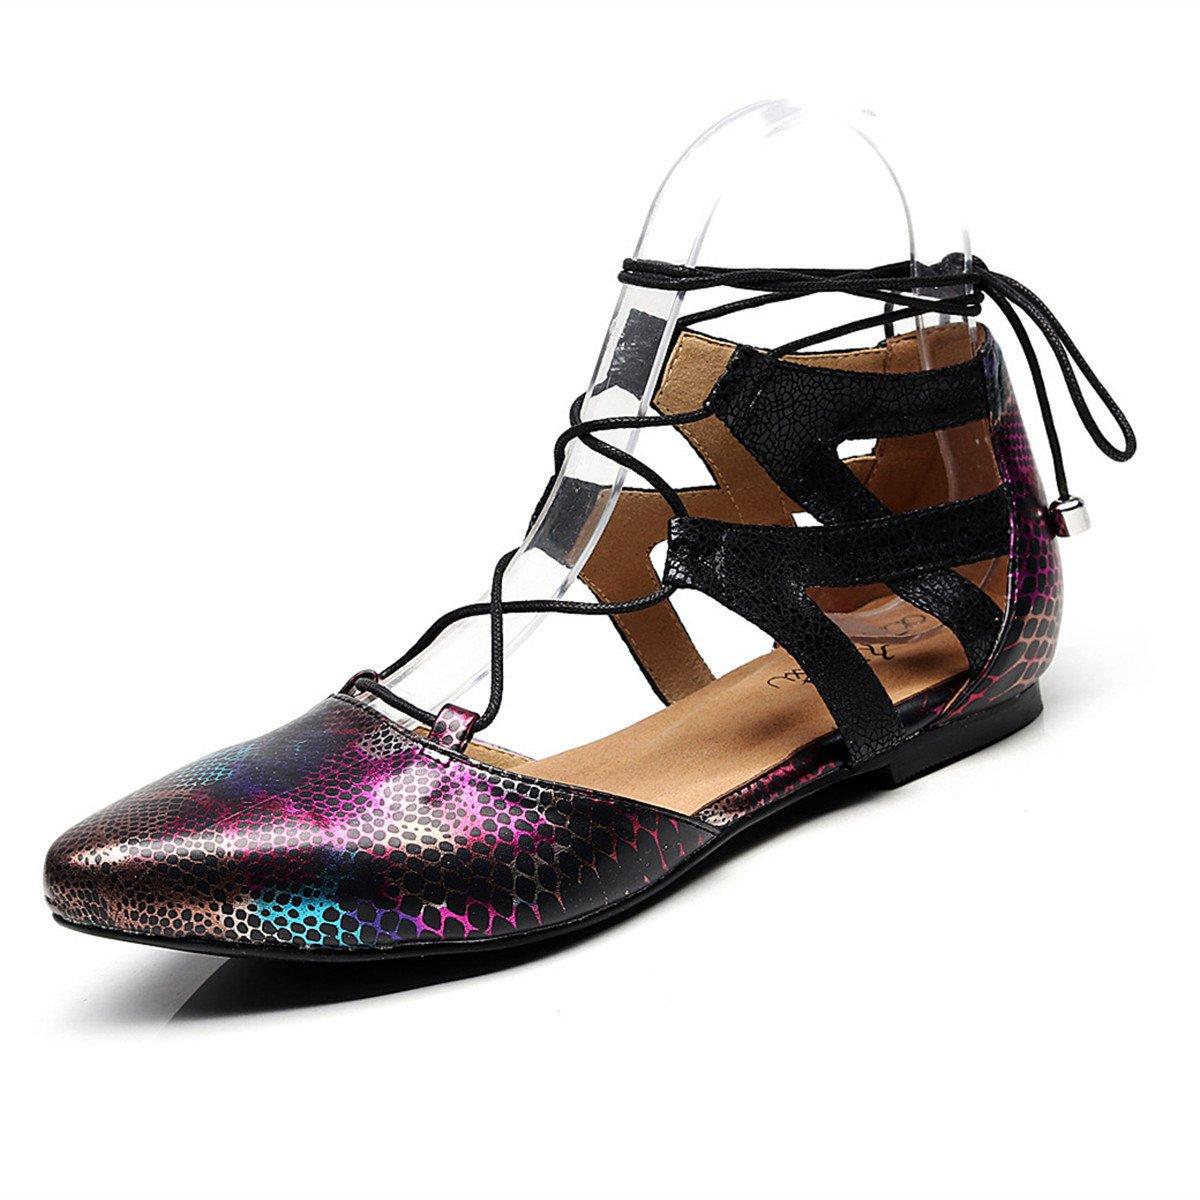 BYLE Riemchen Leder Sandalen Riemchen BYLE Samba Modern Jazz Tanzen Schuhe Flache Latin Tanzen Schuhe 952313